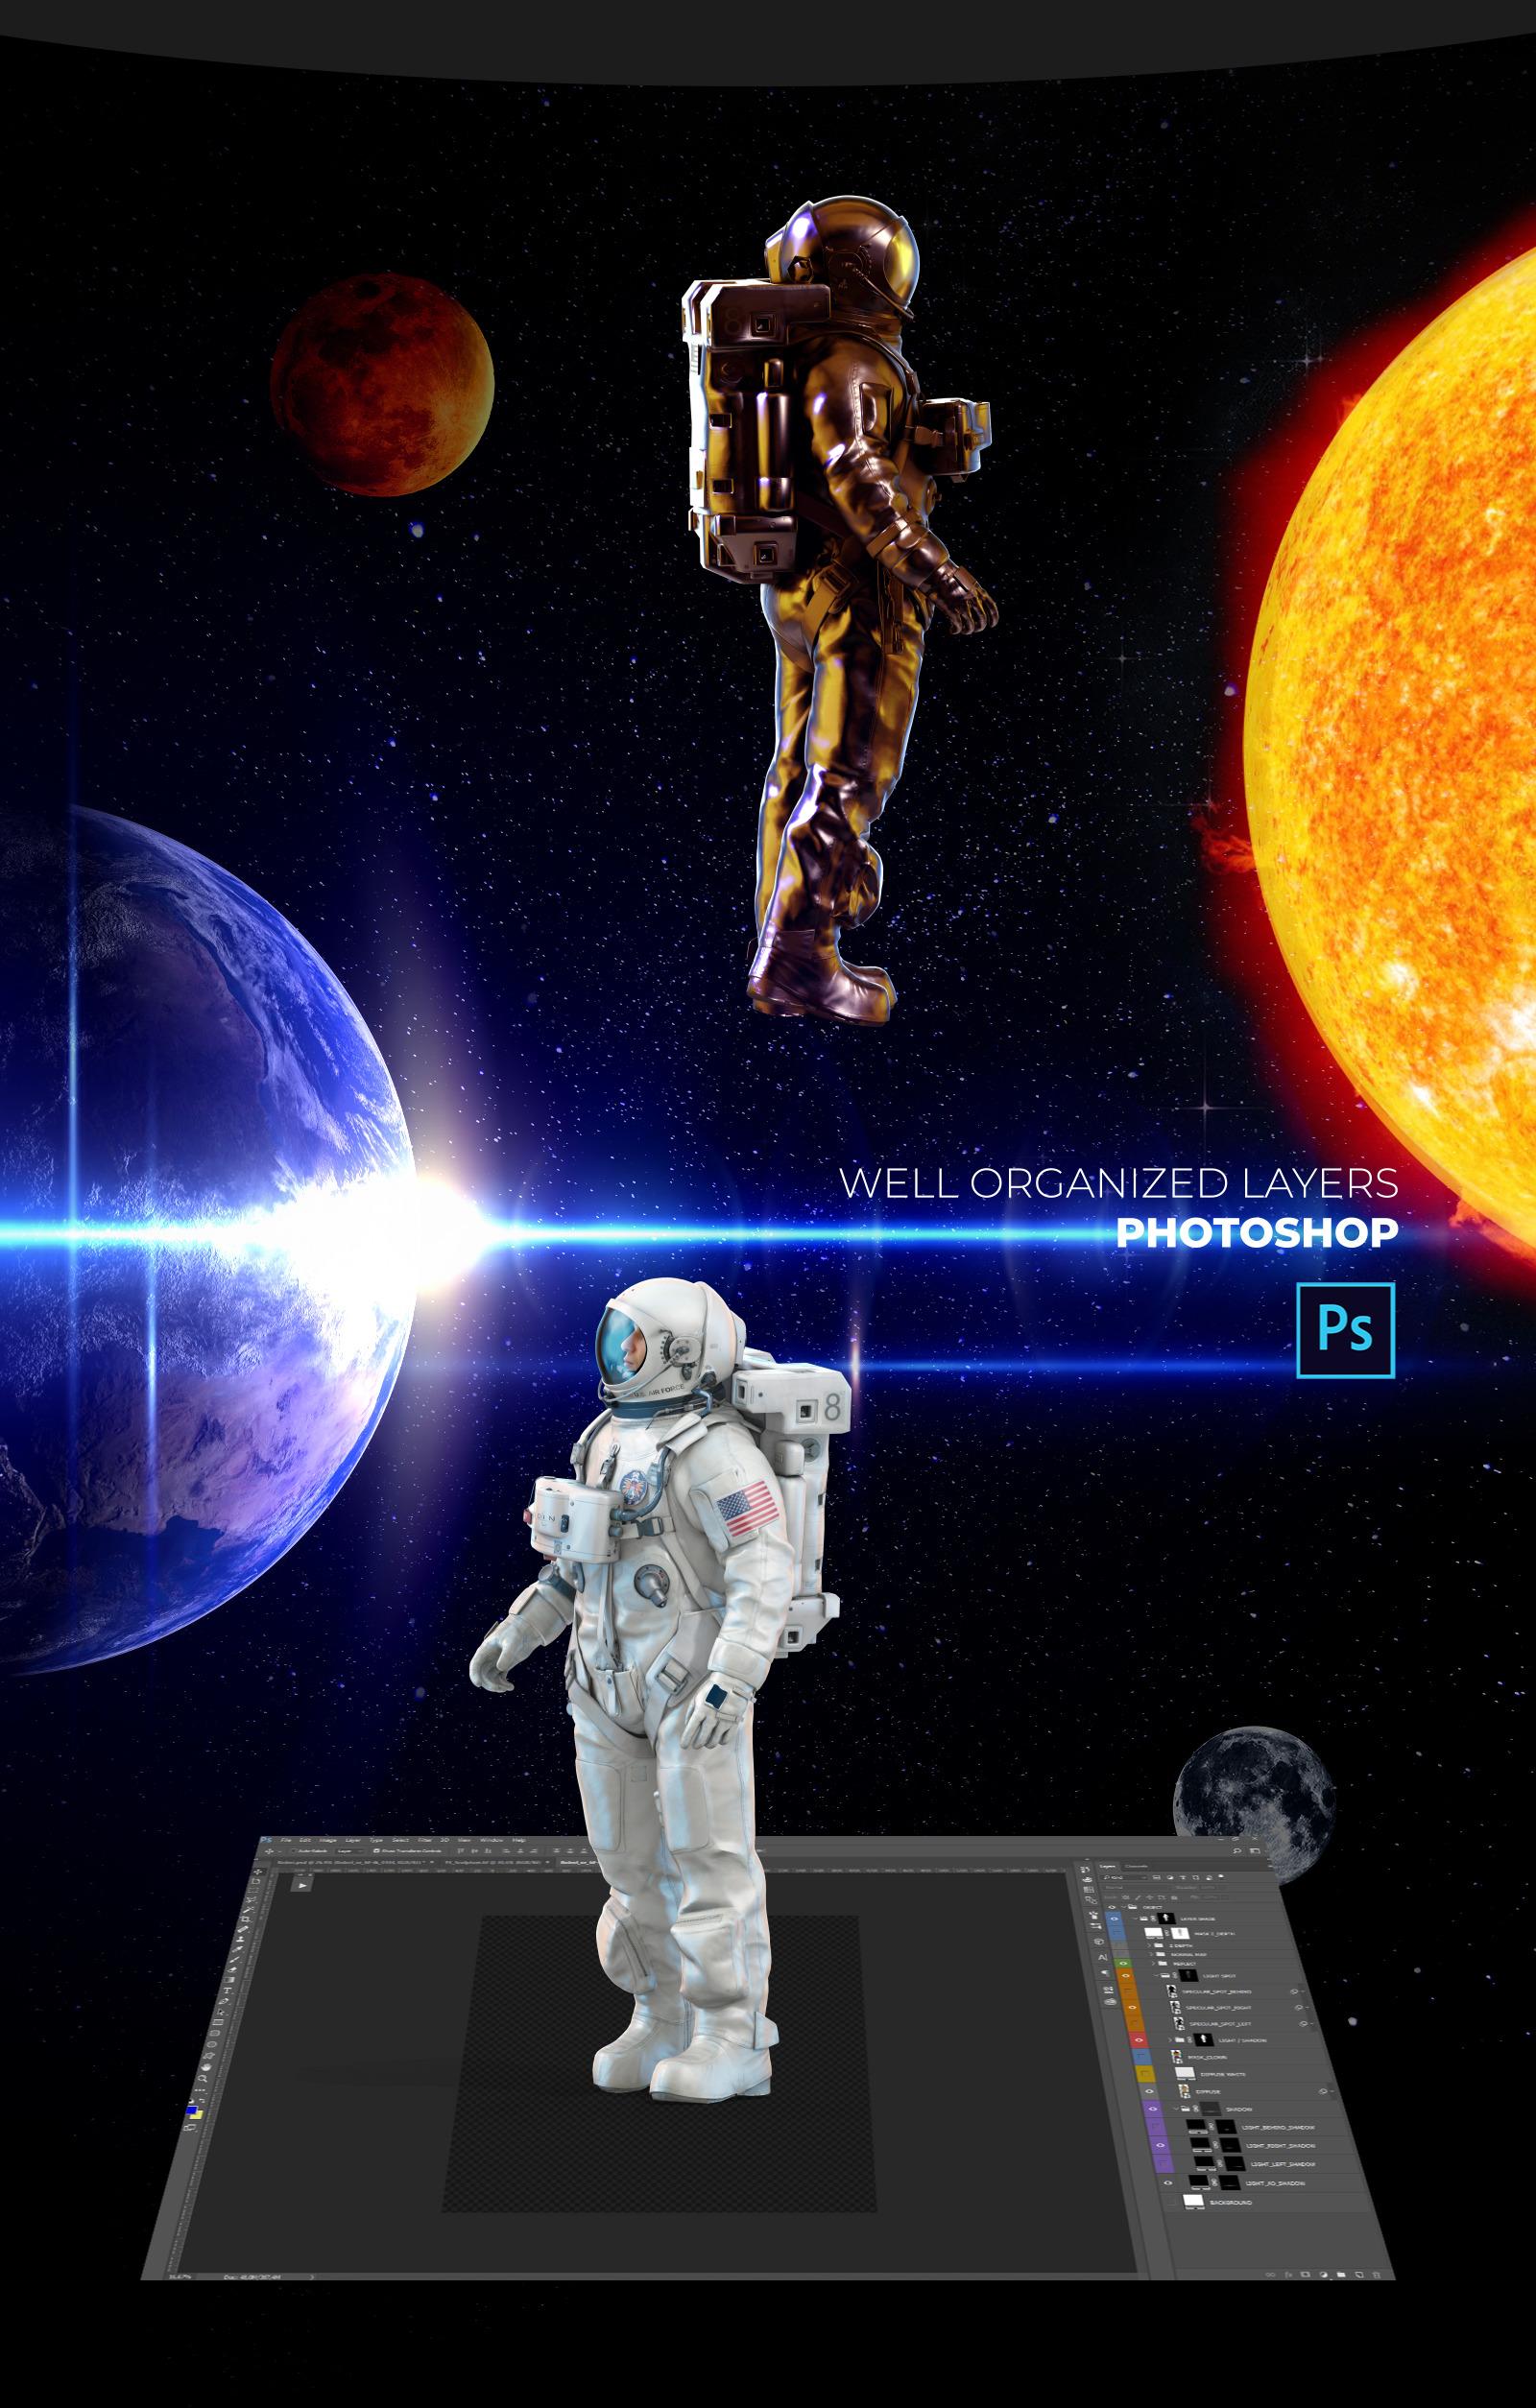 3D Mockup Space Astronaut #06